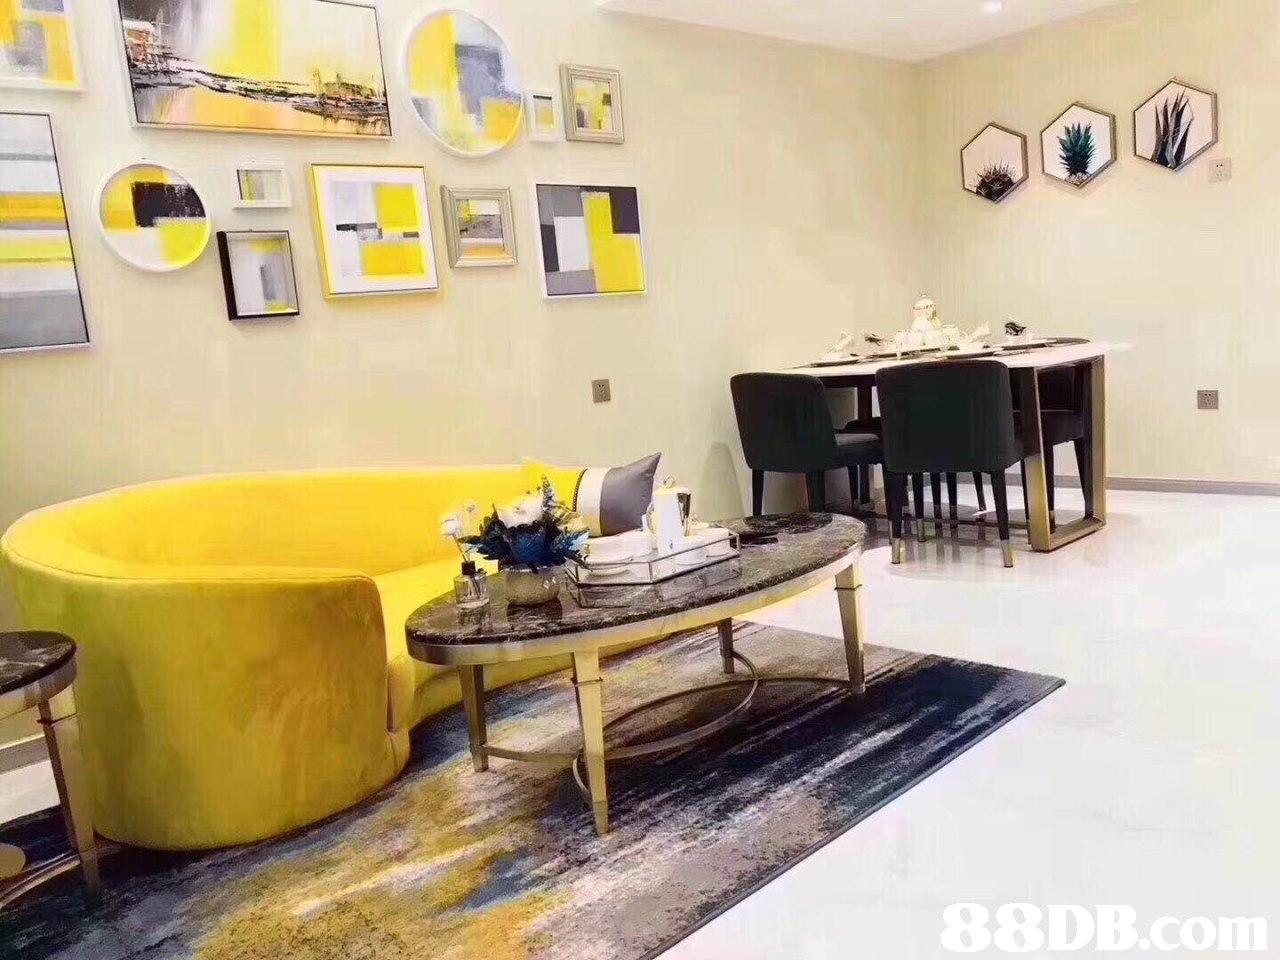 yellow,property,room,interior design,table